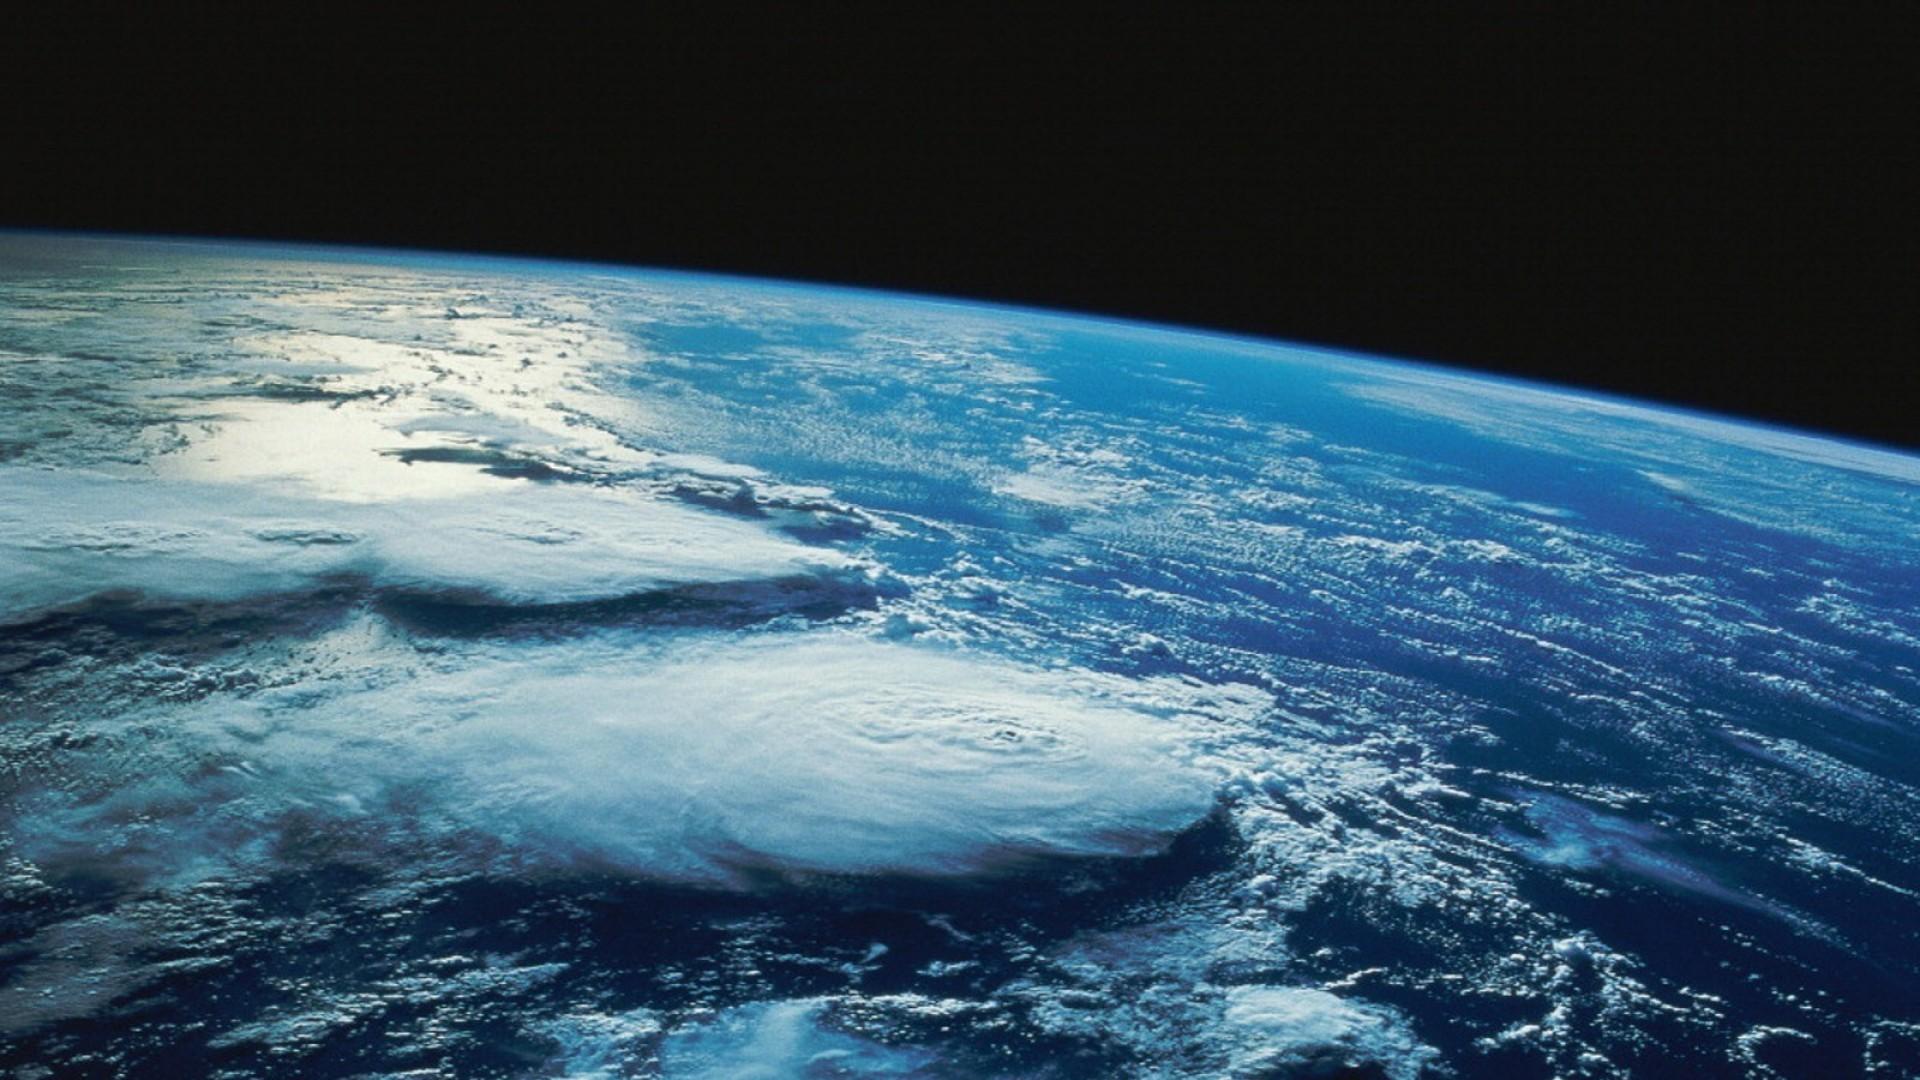 Free Earth Wallpaper. Free Earth Wallpaper 1920×1080